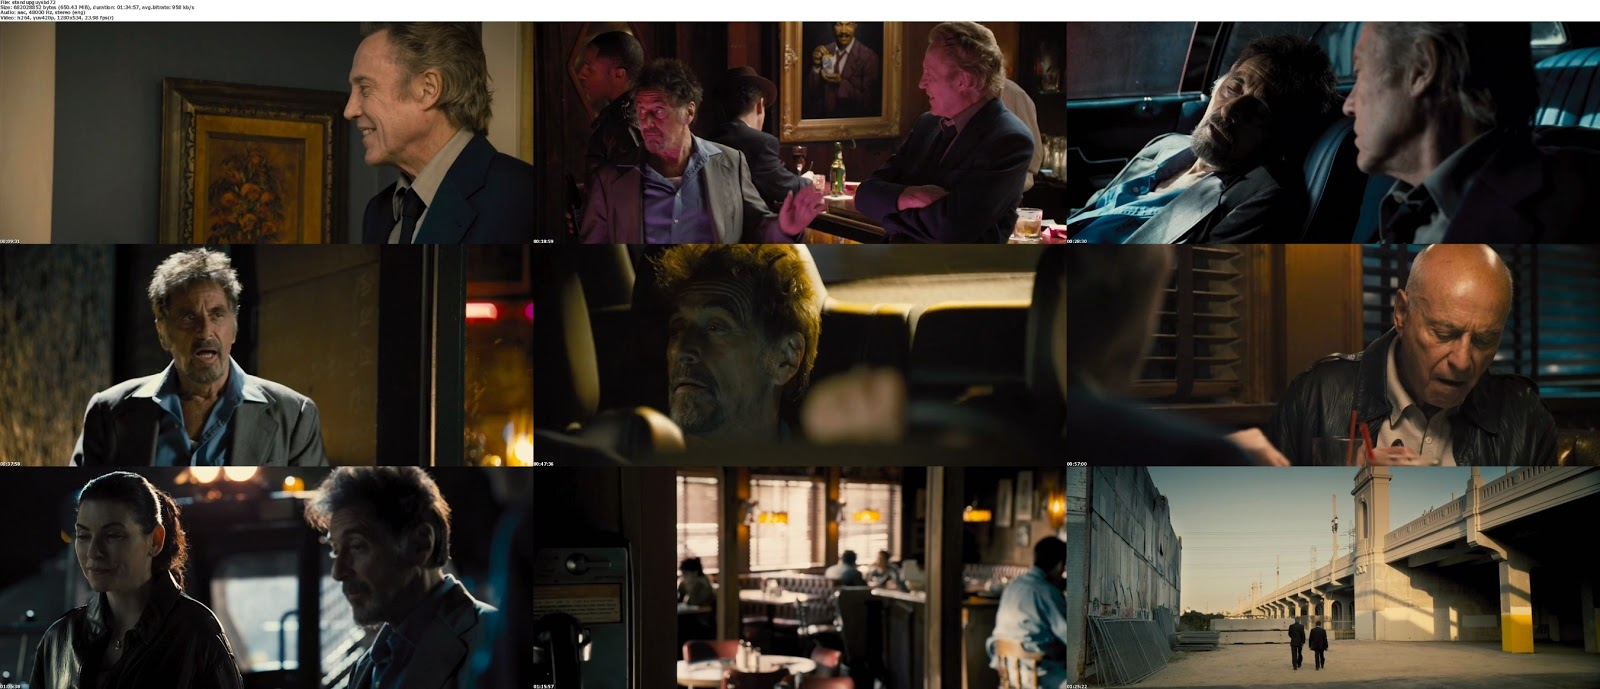 movie screenshot of Stand Up Guys fdmovie.com